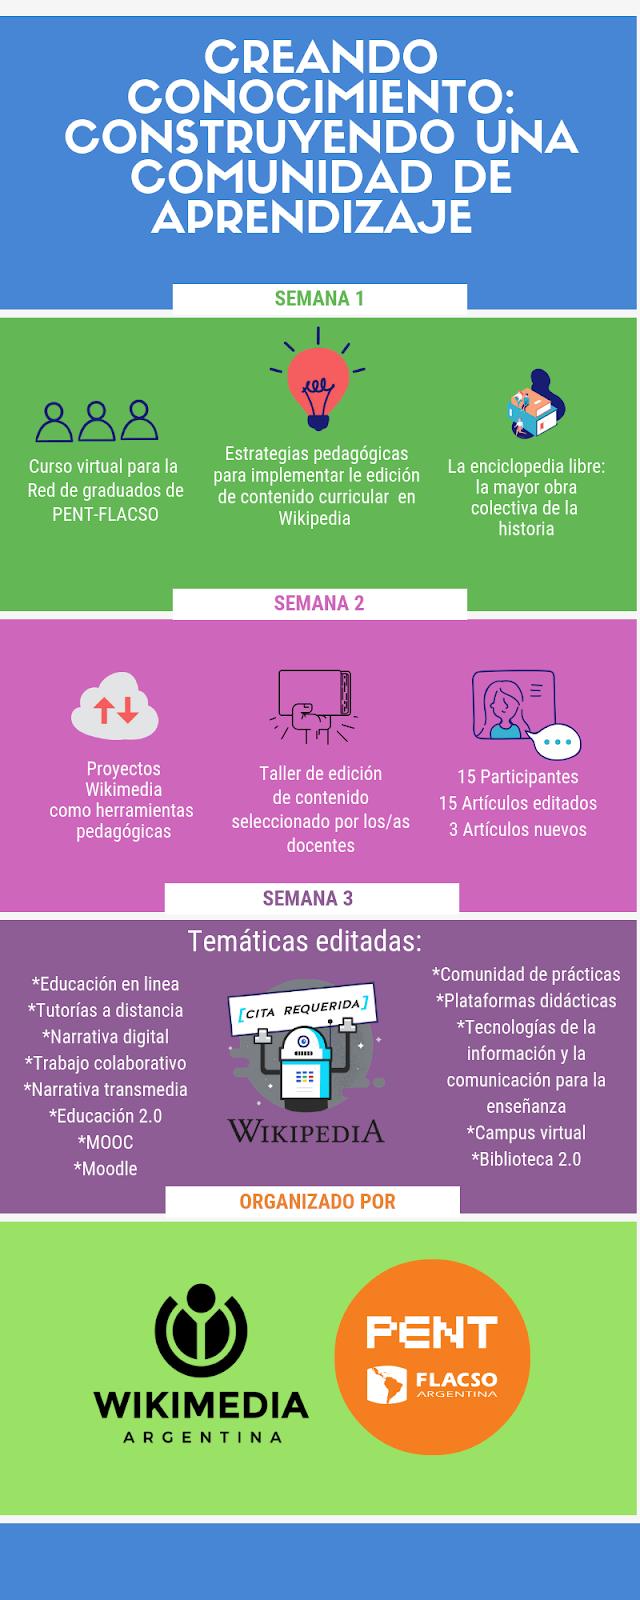 Macintosh HD:Users:eugenia:Desktop:Curso Virtual Wikimedia argentina y pent flacso.png